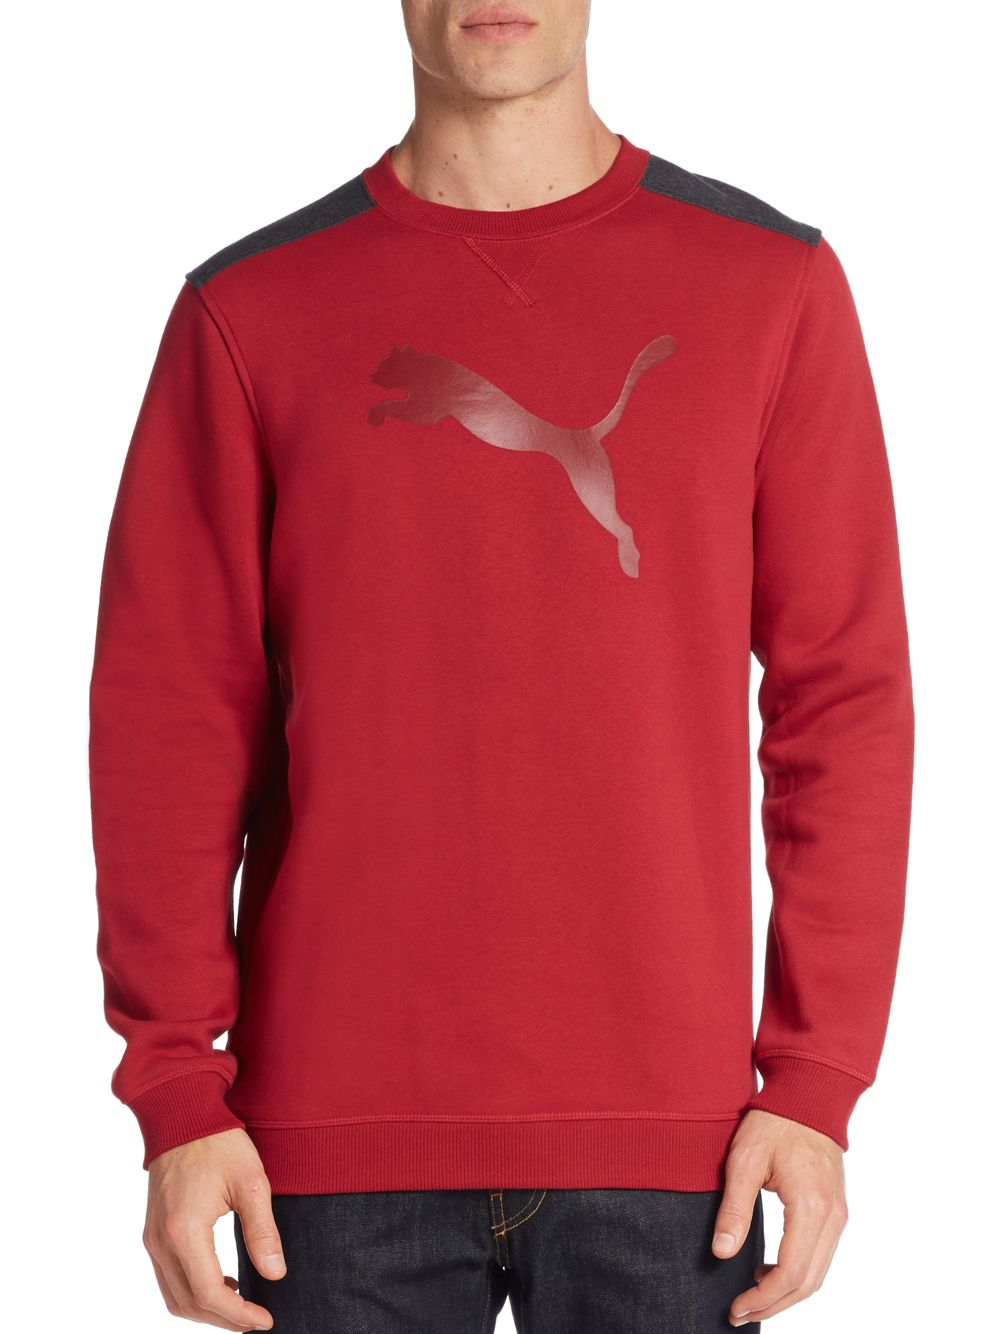 Puma Sweatshirts For Men Www Imgkid Com The Image Kid Has It